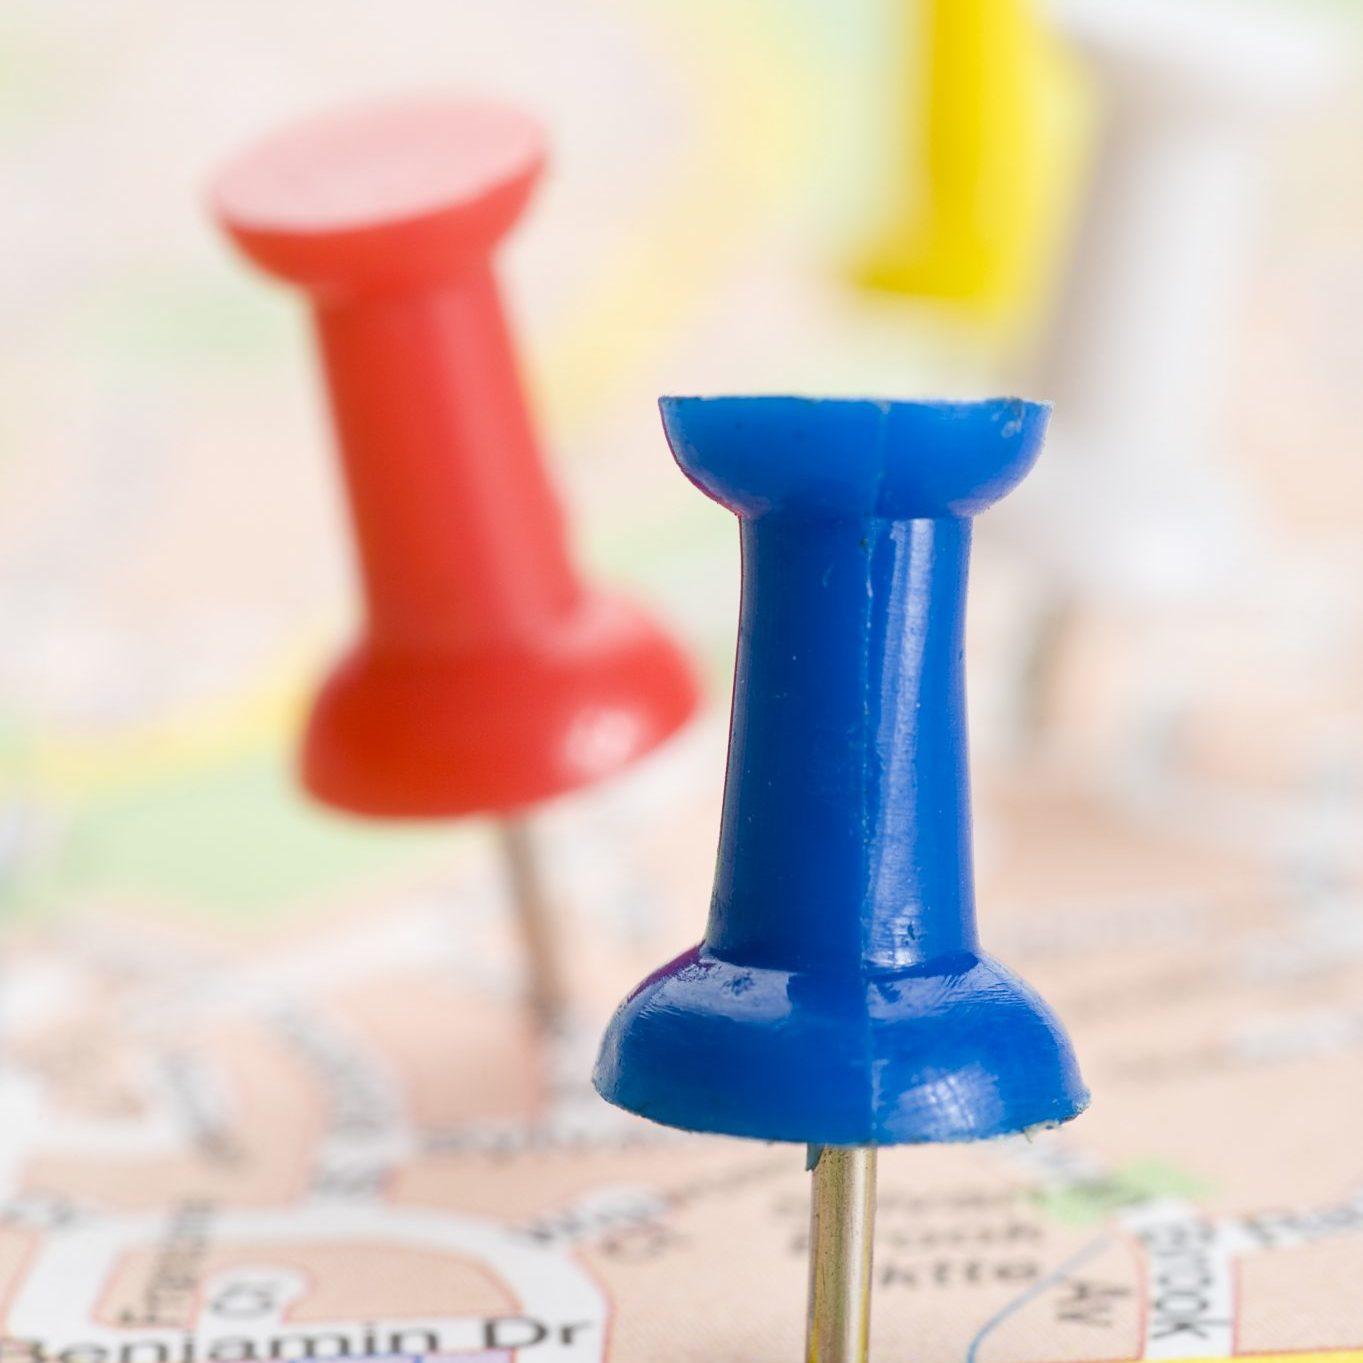 bigstock-Pushpins-marking-a-location-on-23009036